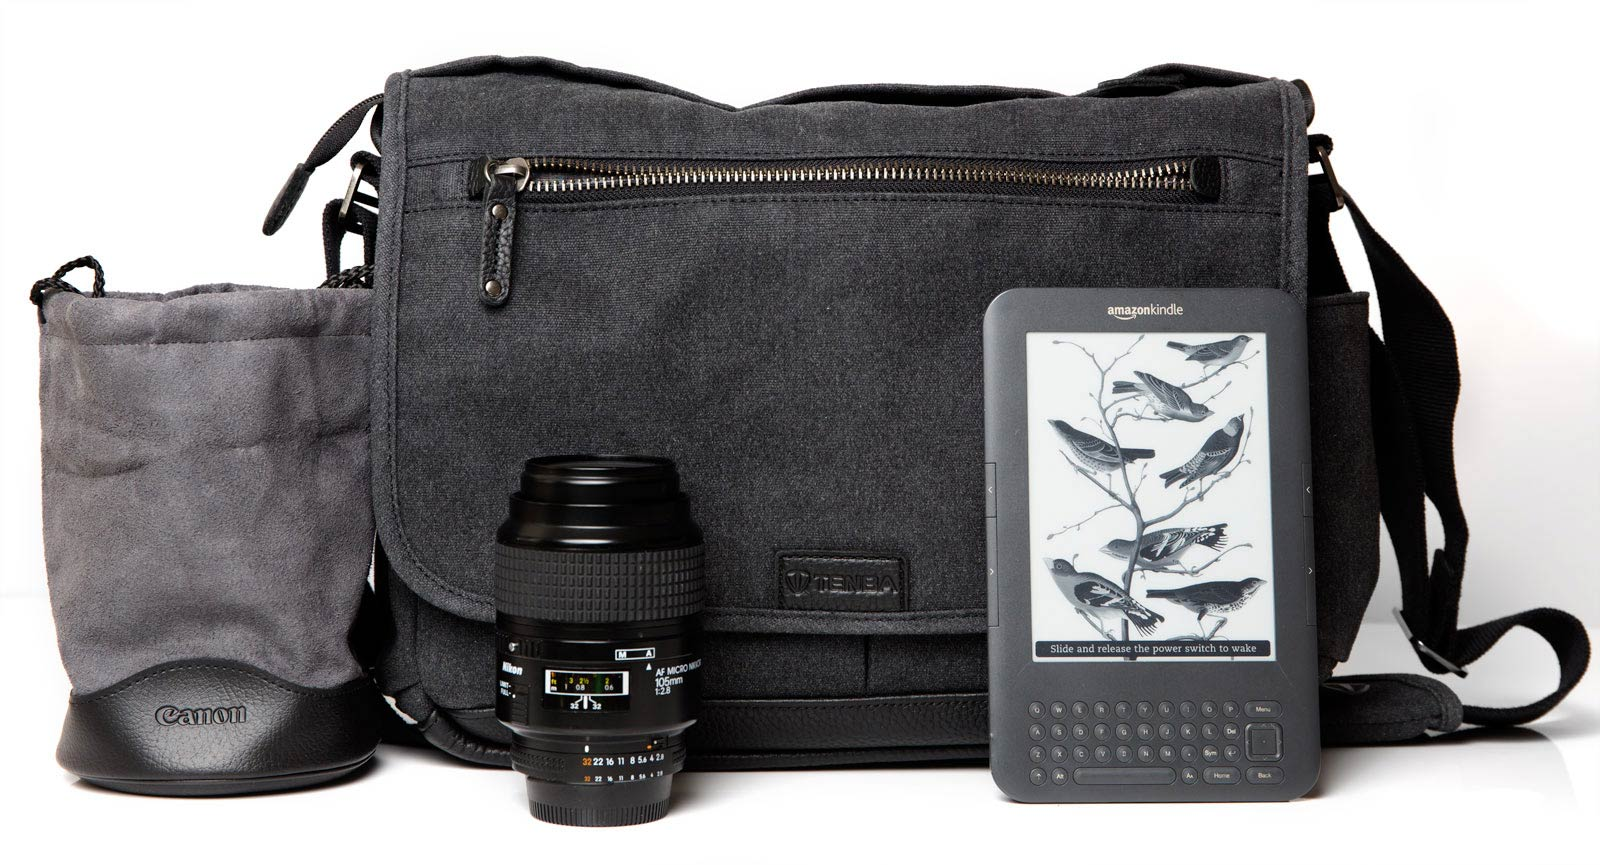 ebb2d7b038 Review  Tenba Cooper Series DSLR 13 Shoulder Bag – Light And Matter